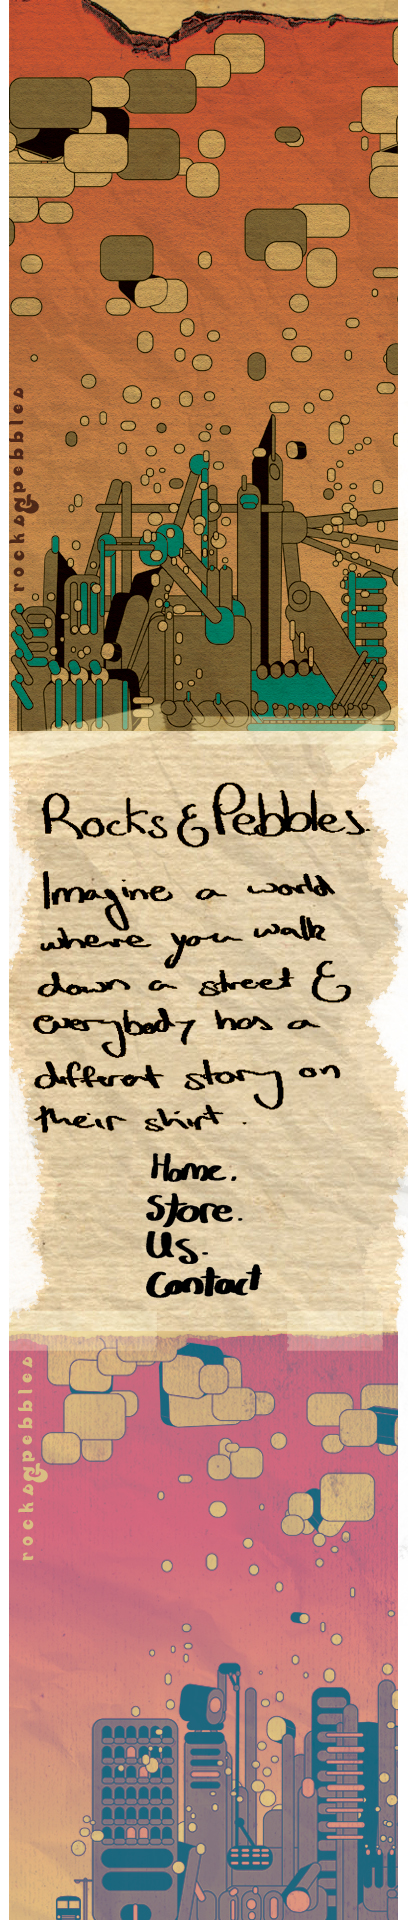 Rocks and Pebbles. Intro.